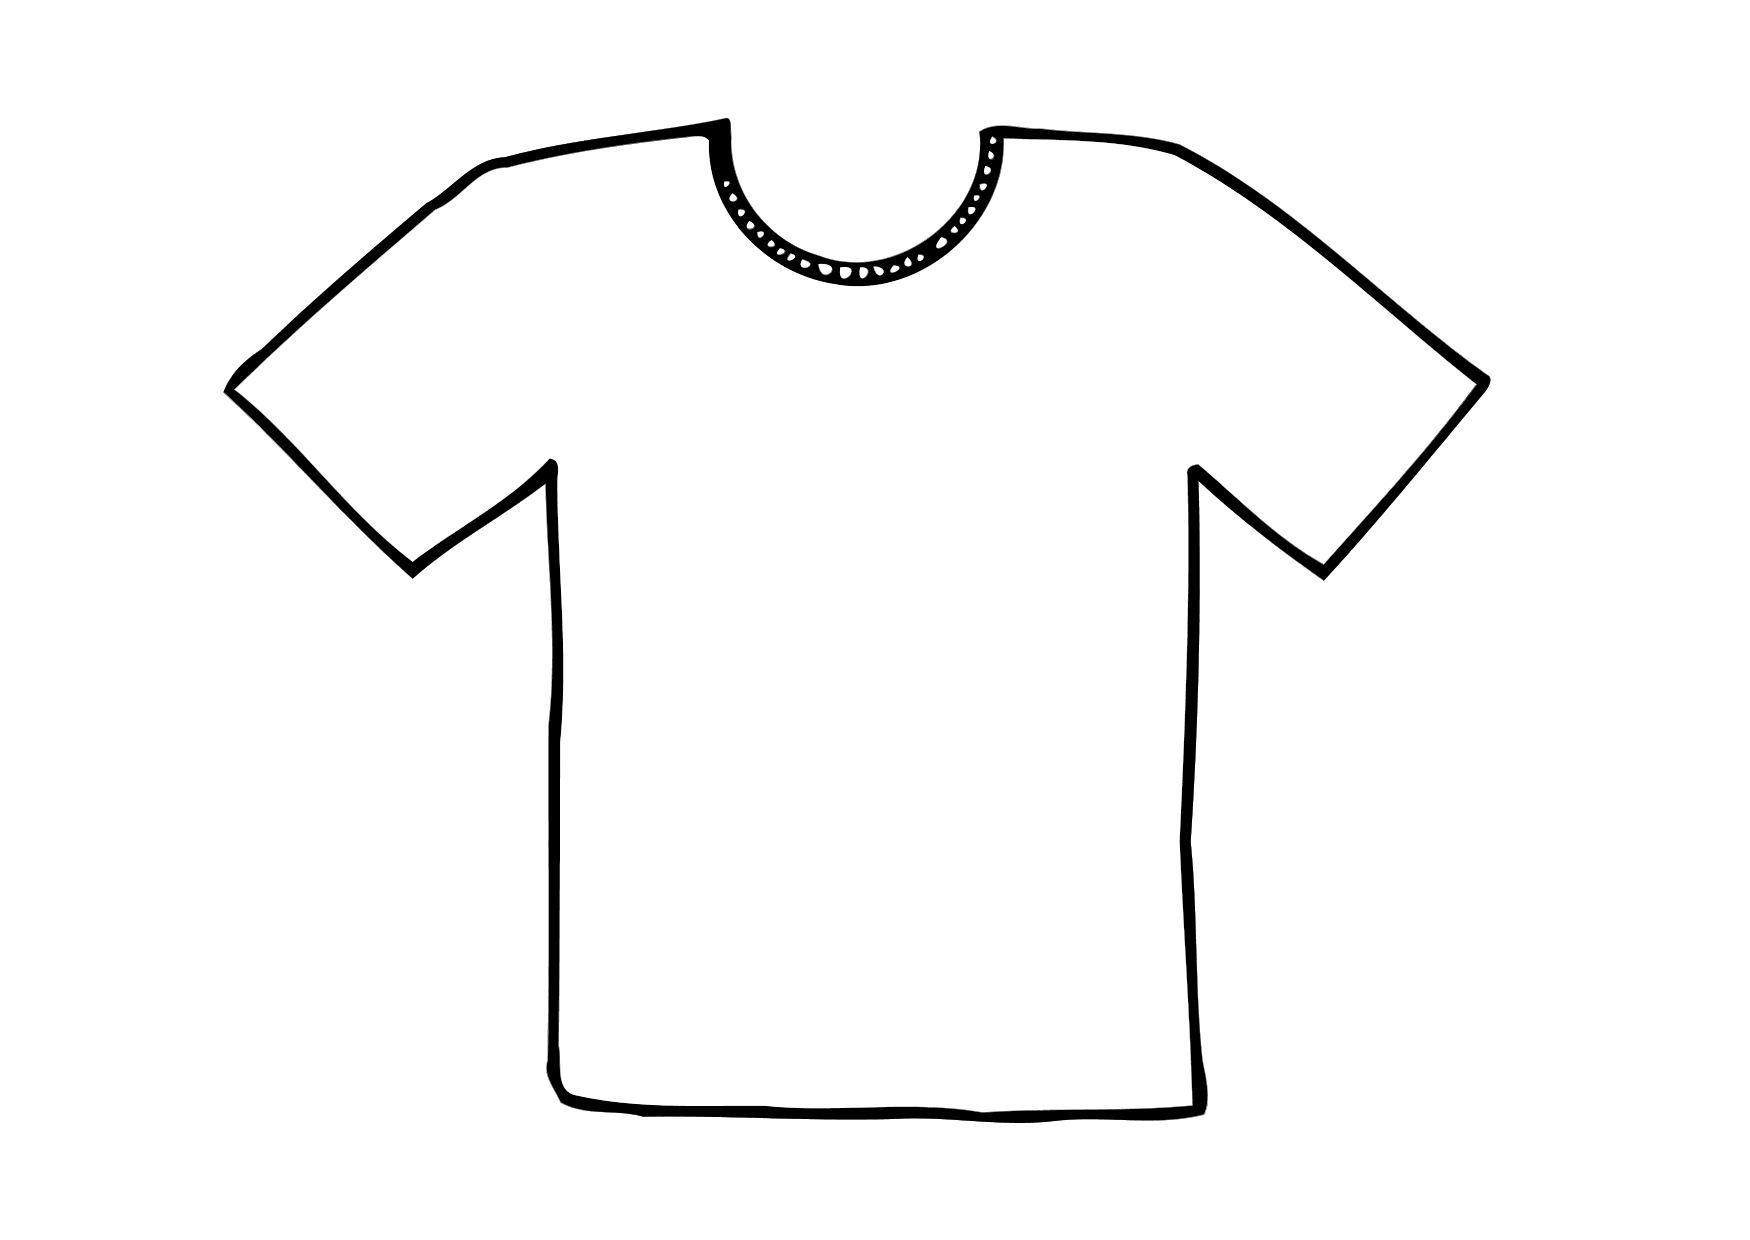 Dibujo para colorear Camiseta - Img 12295